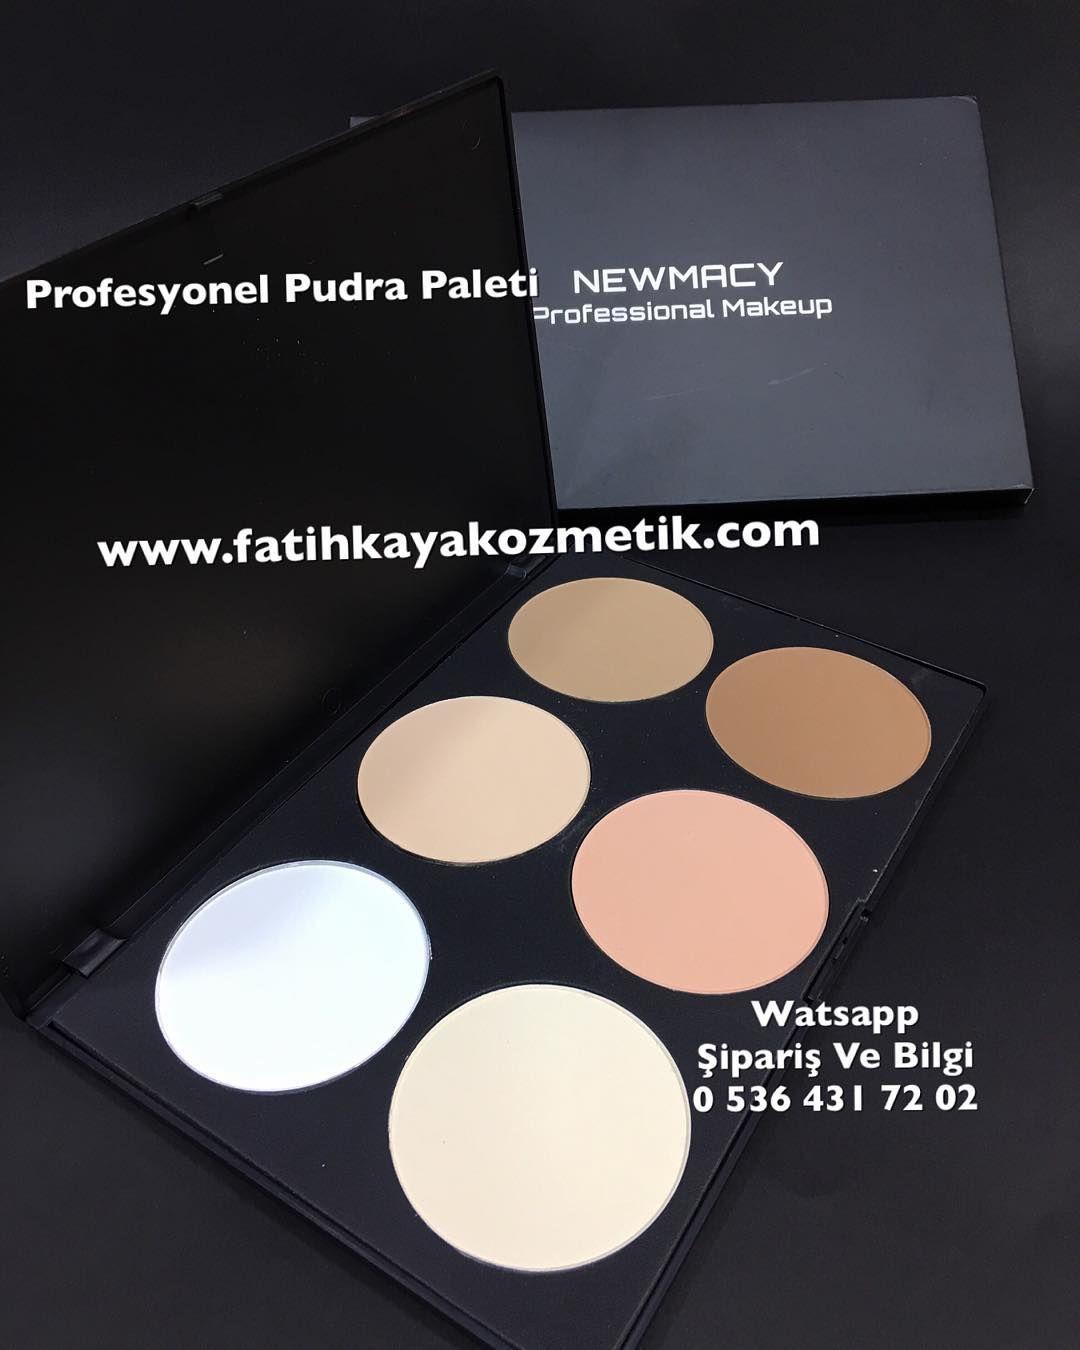 #Makeup #Beauty #Makeupaddict#kozmetikpasaji#Makeupjunkie #Makeuplover #Makeupforever #Makeupbyme #Makeupmafia #Gözmakyajı #kalıcımakyaj #Makeupoftheday #Makeuplook #instamakyaj #Mascara #Makeupgeek #Makeuplovers #makyaj #instamakeup by kozmetikpasaji